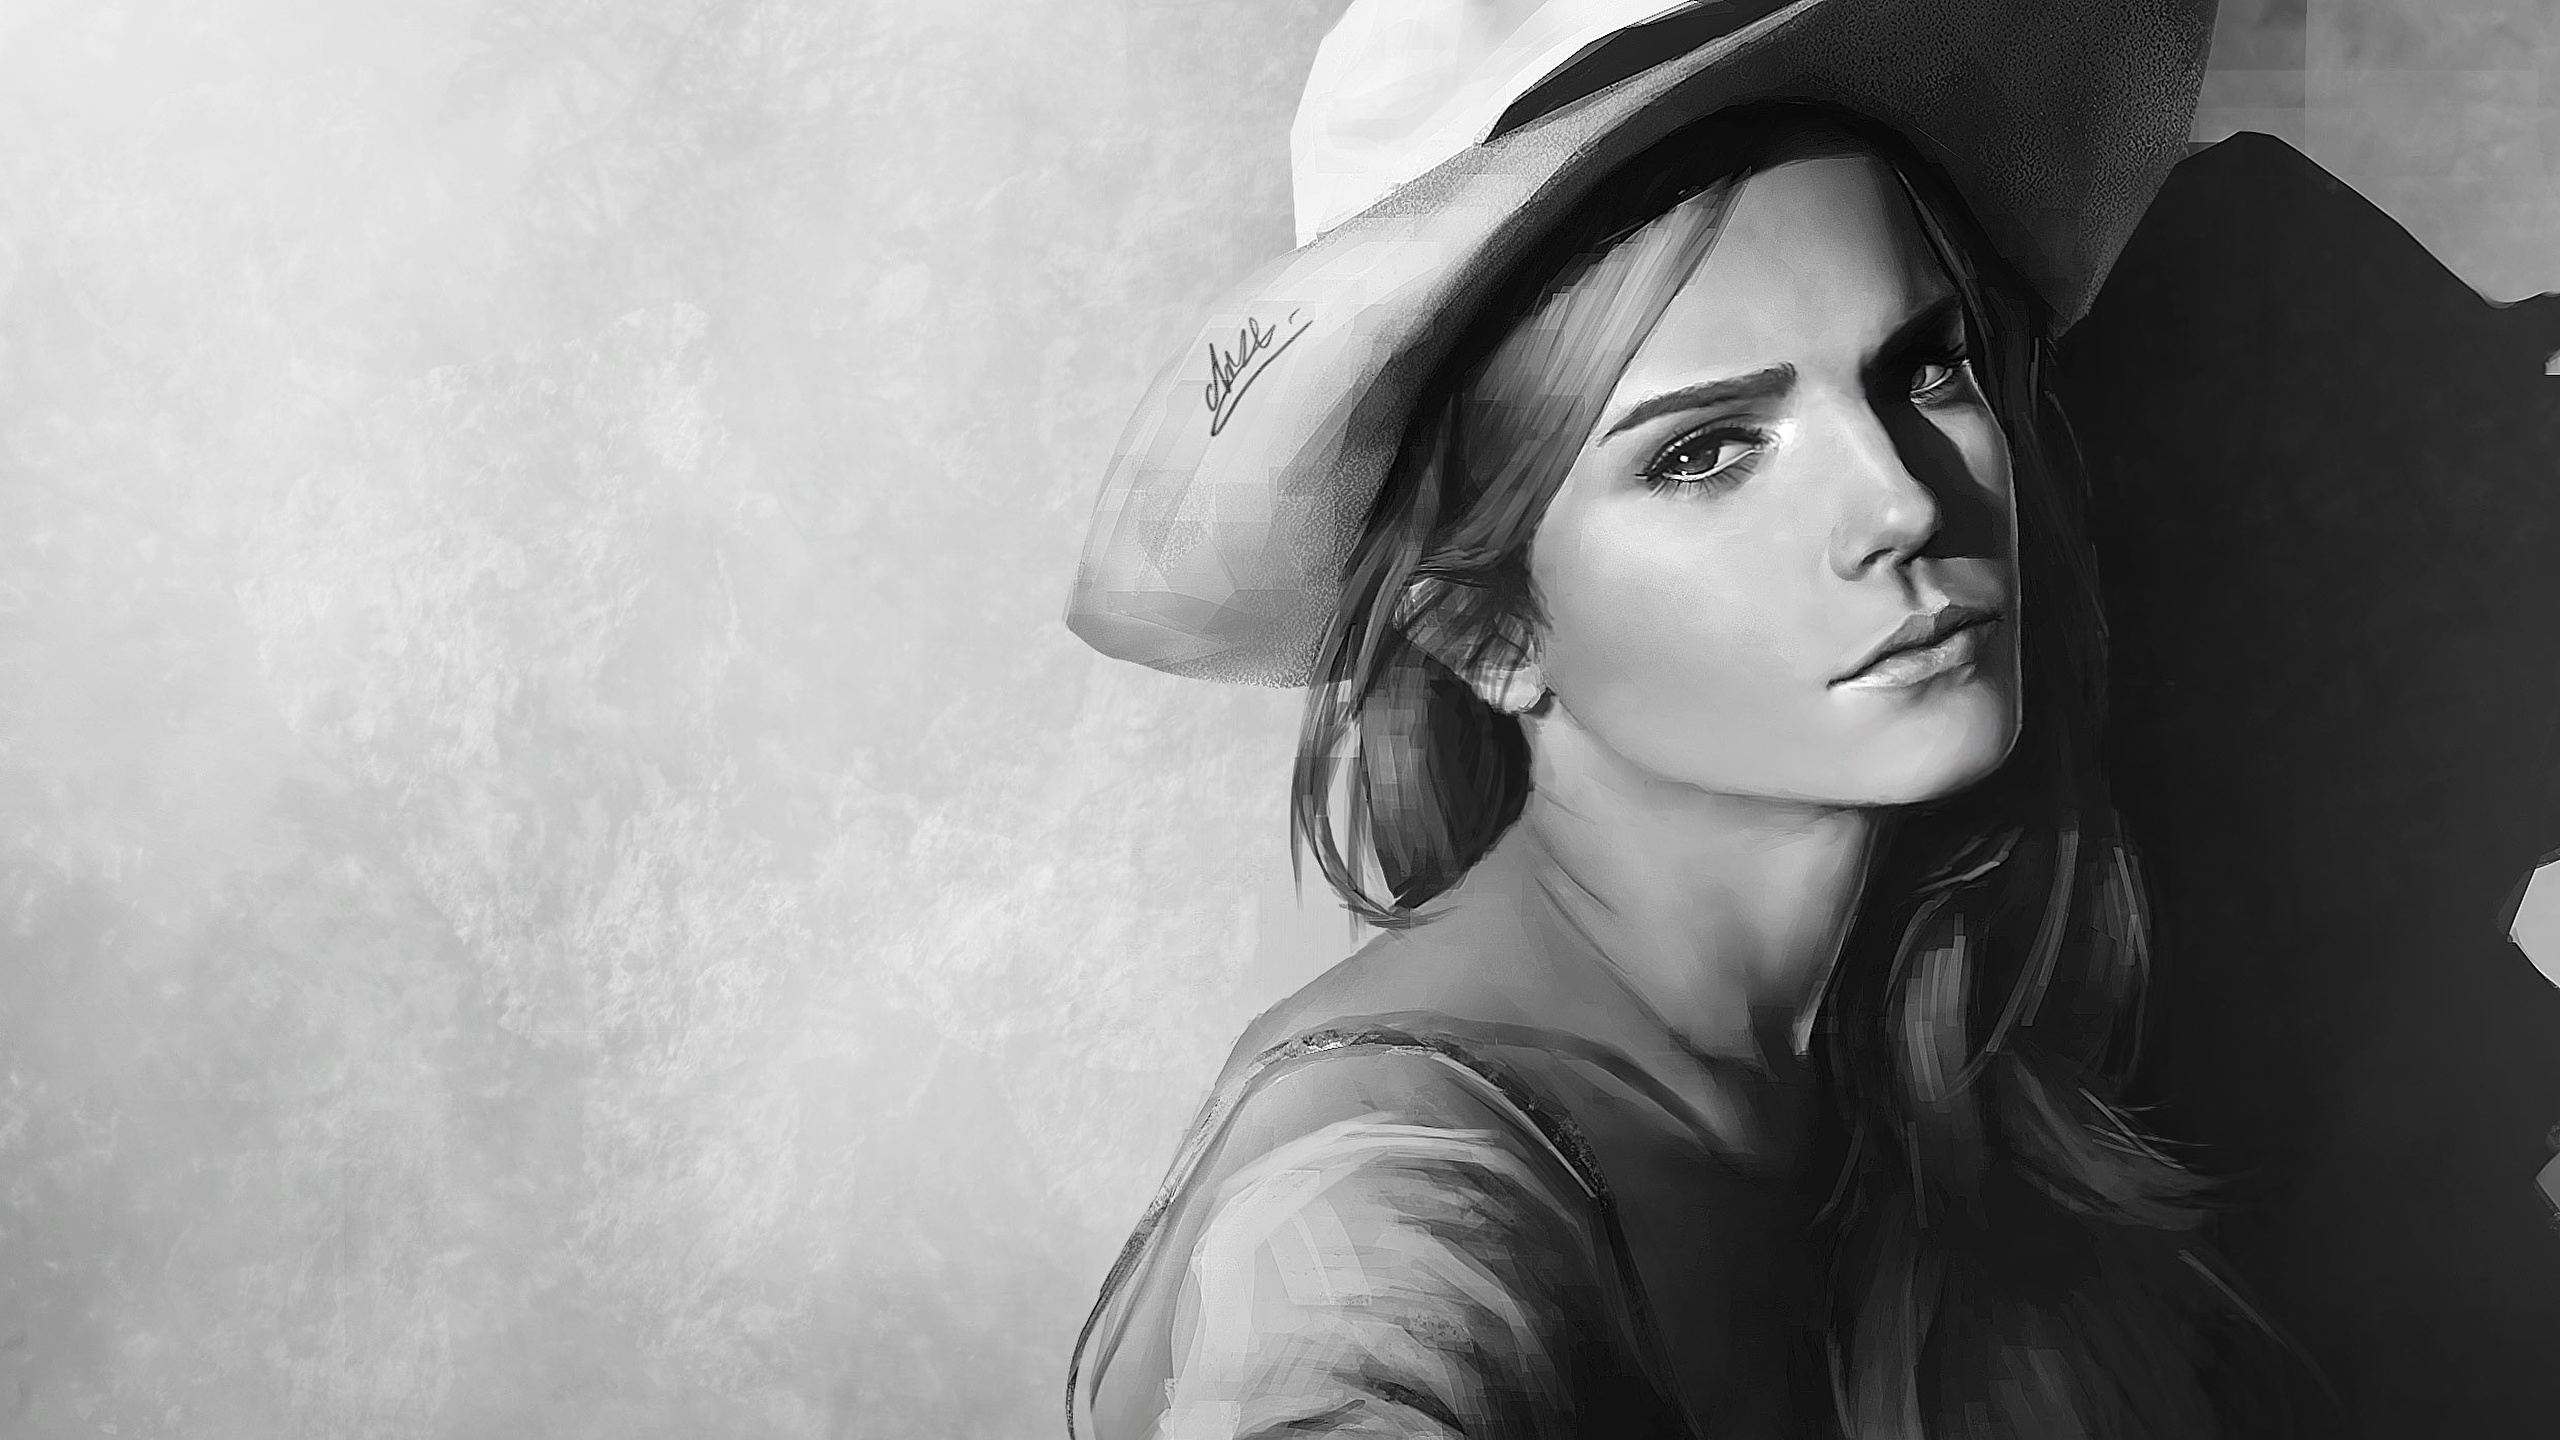 Wallpaper Emma Watson Beautiful Hat Young Woman Black And 2560x1440